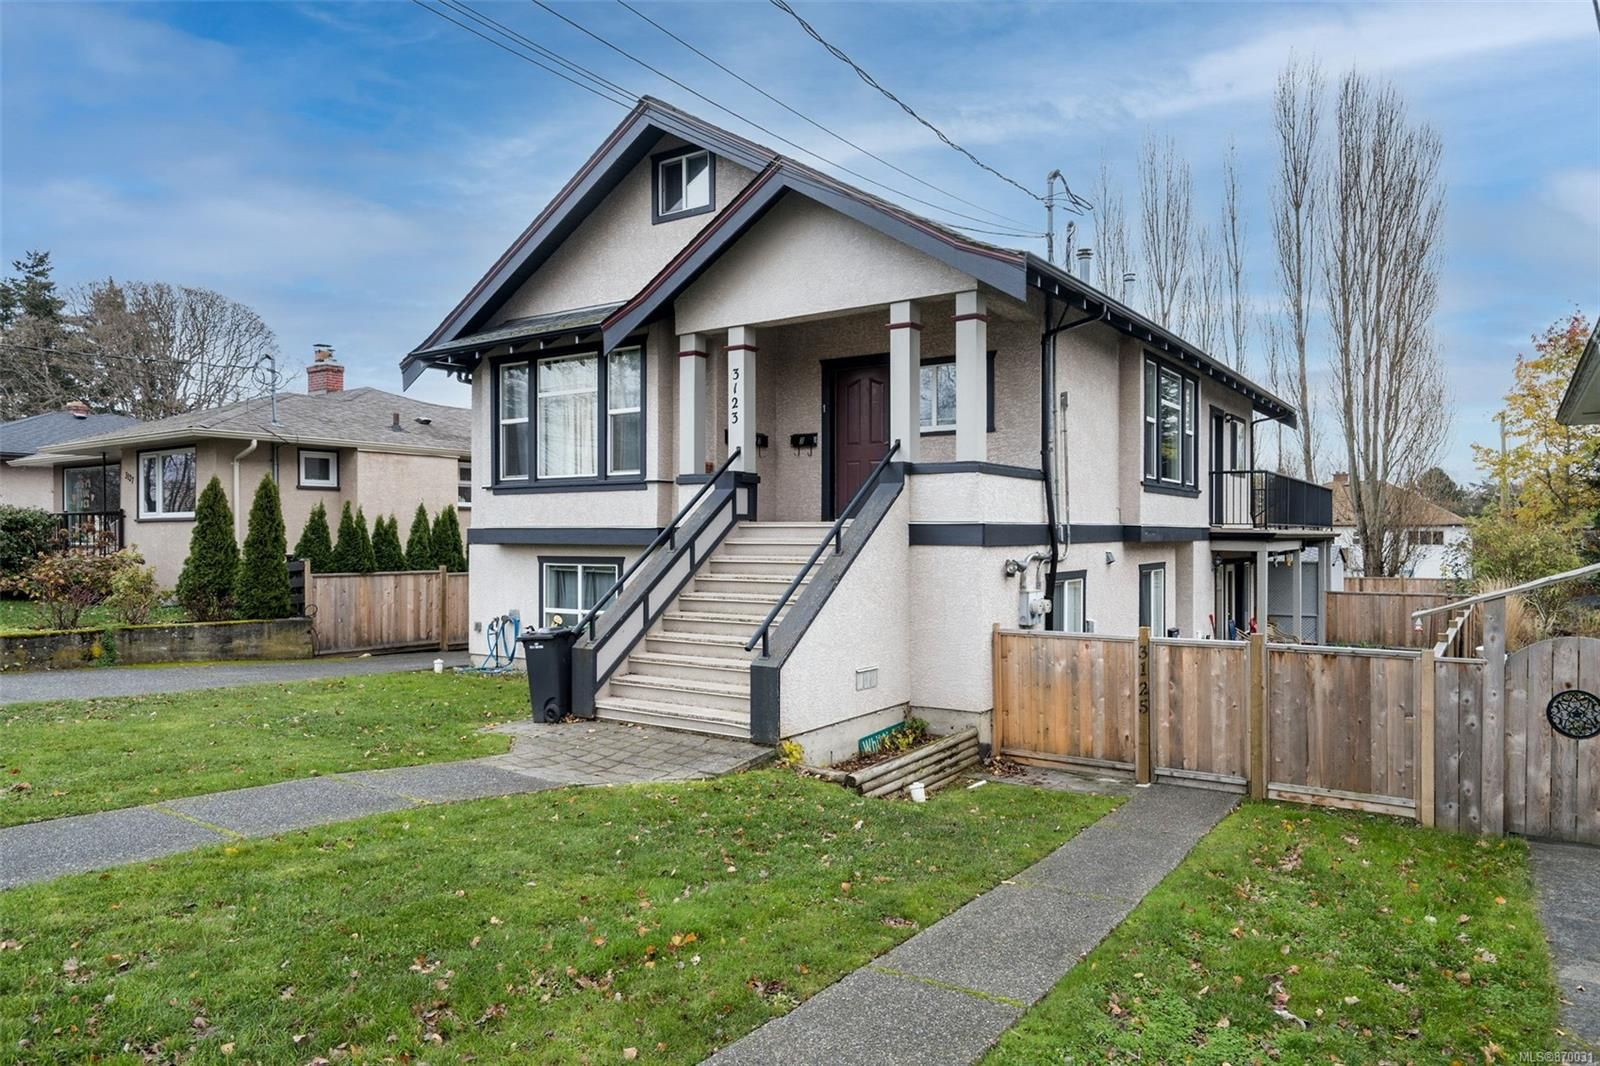 Main Photo: 3125 Irma St in : Vi Burnside Row/Townhouse for sale (Victoria)  : MLS®# 870031